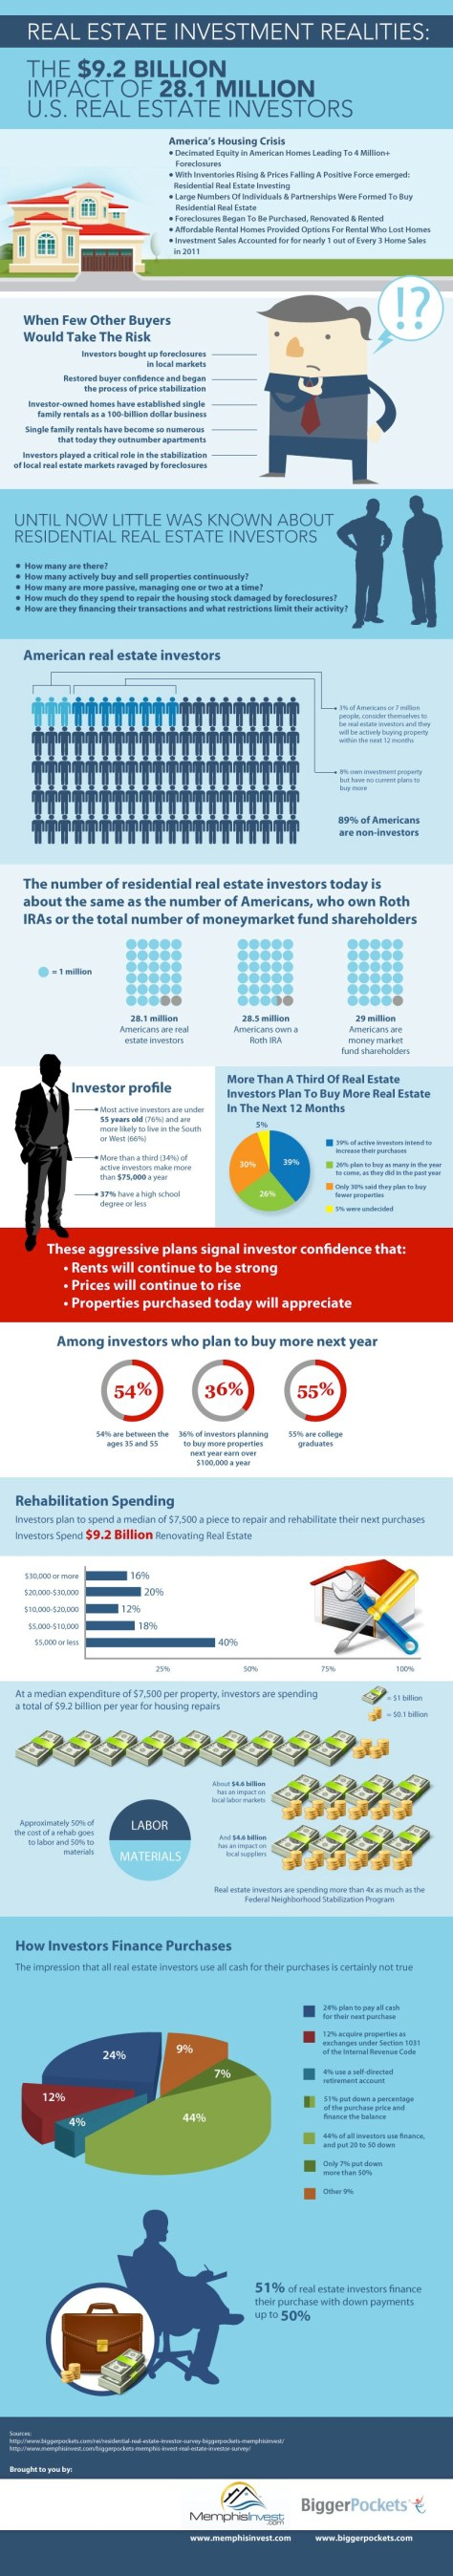 the-92-billion-impact-of-real-estate-investors_5068c09ce5873